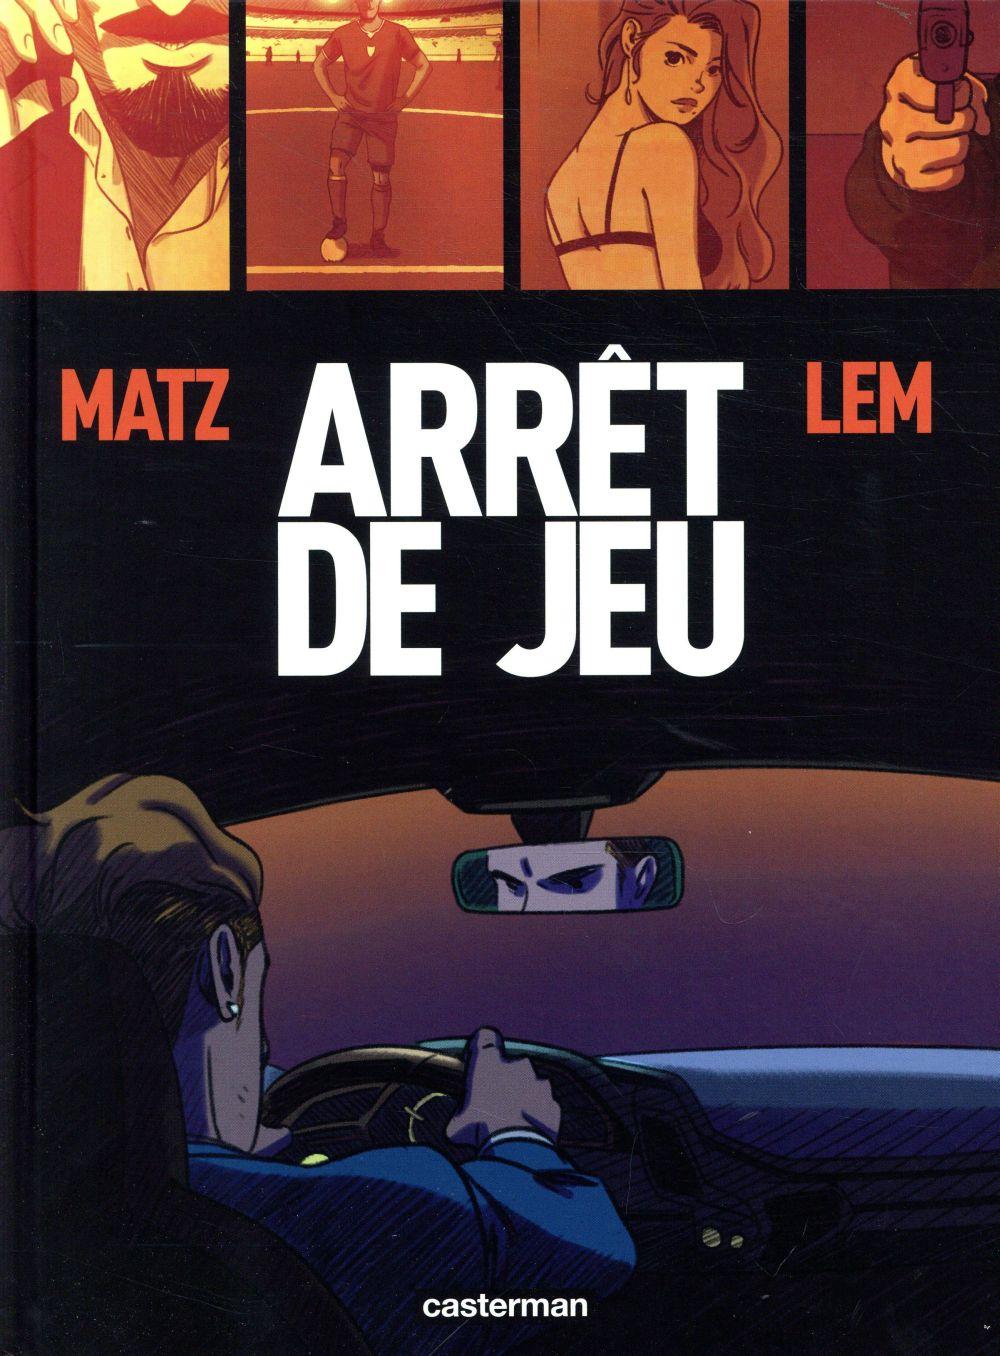 ARRET DE JEU MATZ/LEMUR/SAUVETRE CASTERMAN